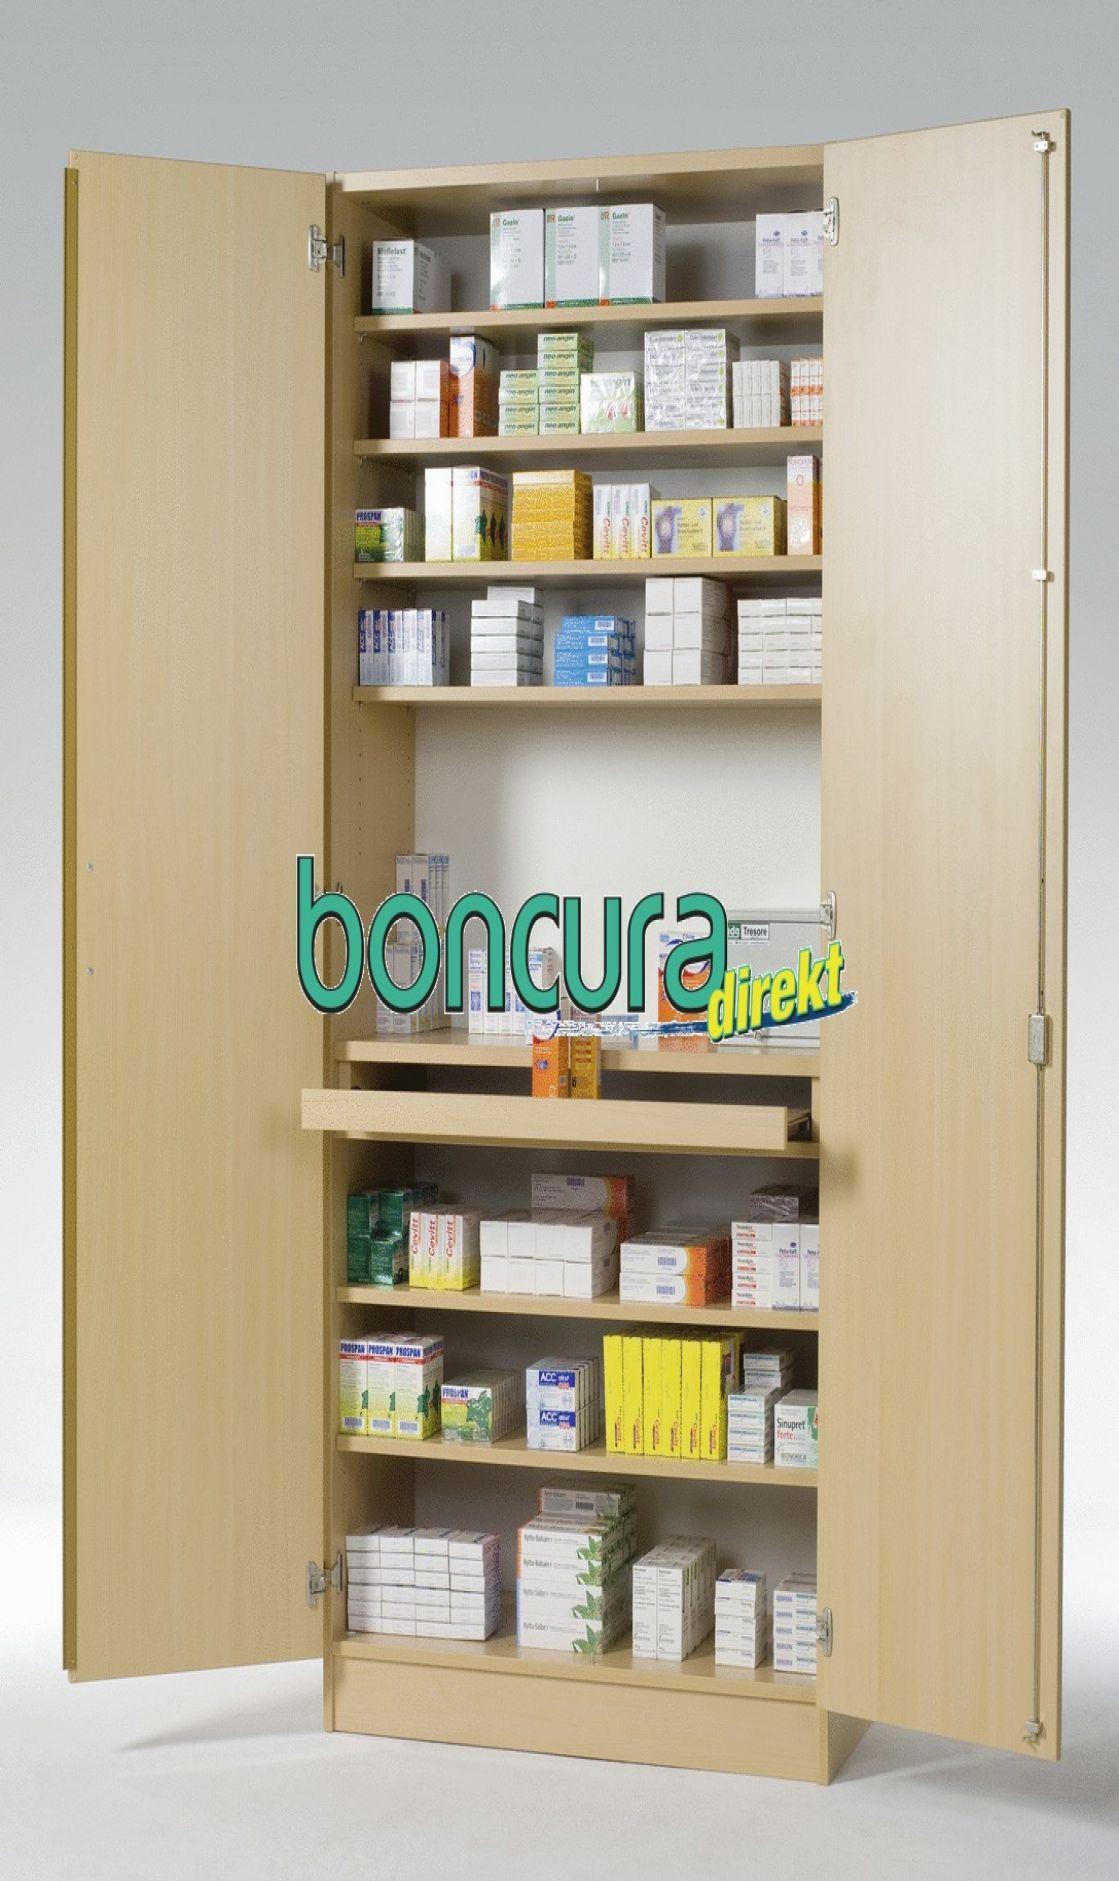 10 Schon Medikamenten Schrank In 2020 Ikea Schrank Schrank Schrank Design